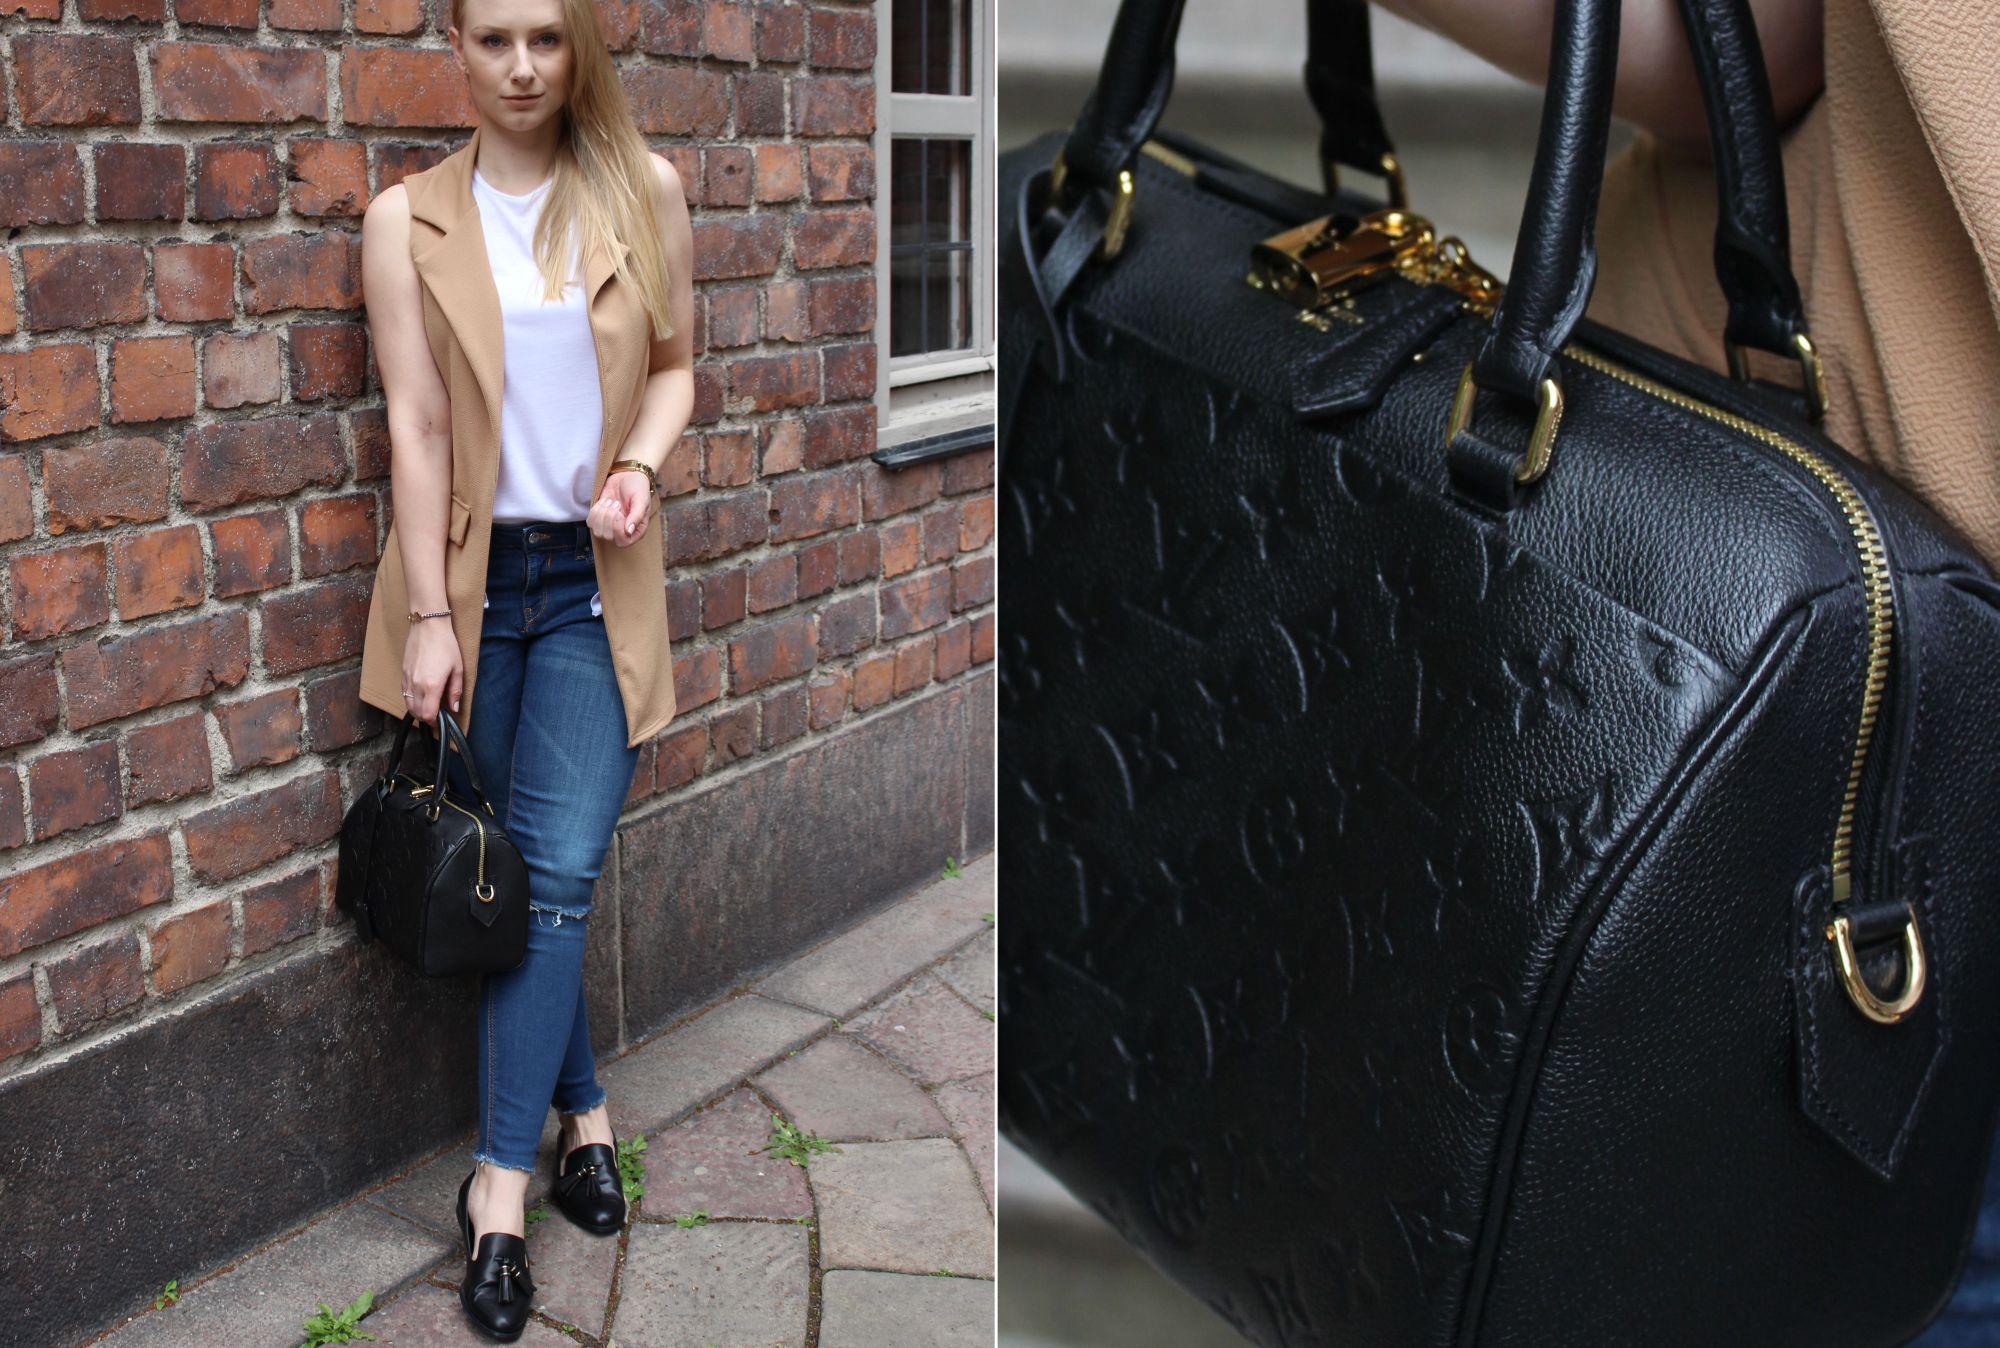 TOP 16 - Louis Vuitton Speddy 25 Bag 1